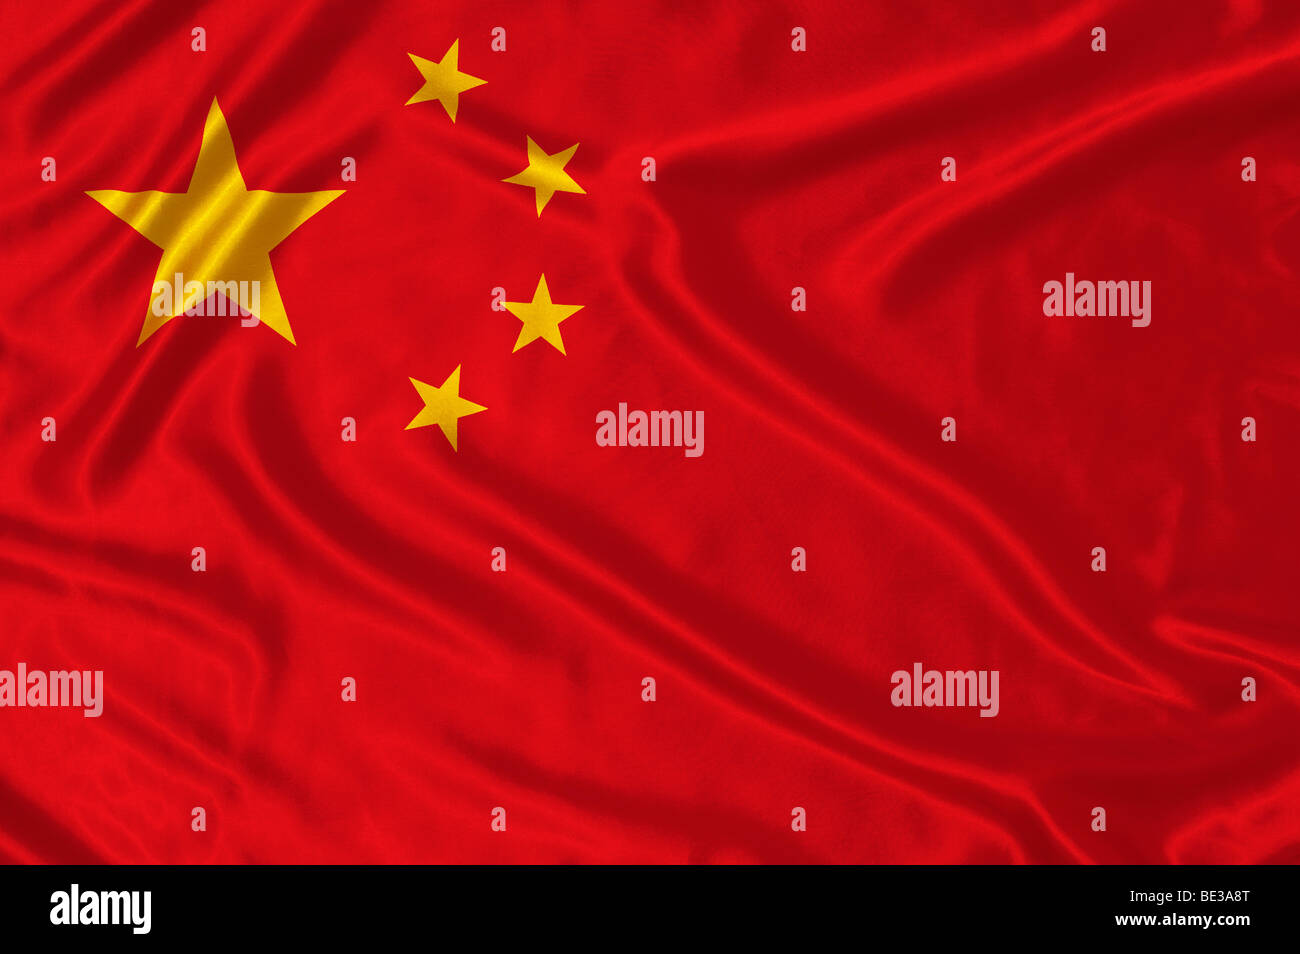 Rippled Chinese flag. National flag of China - Stock Image